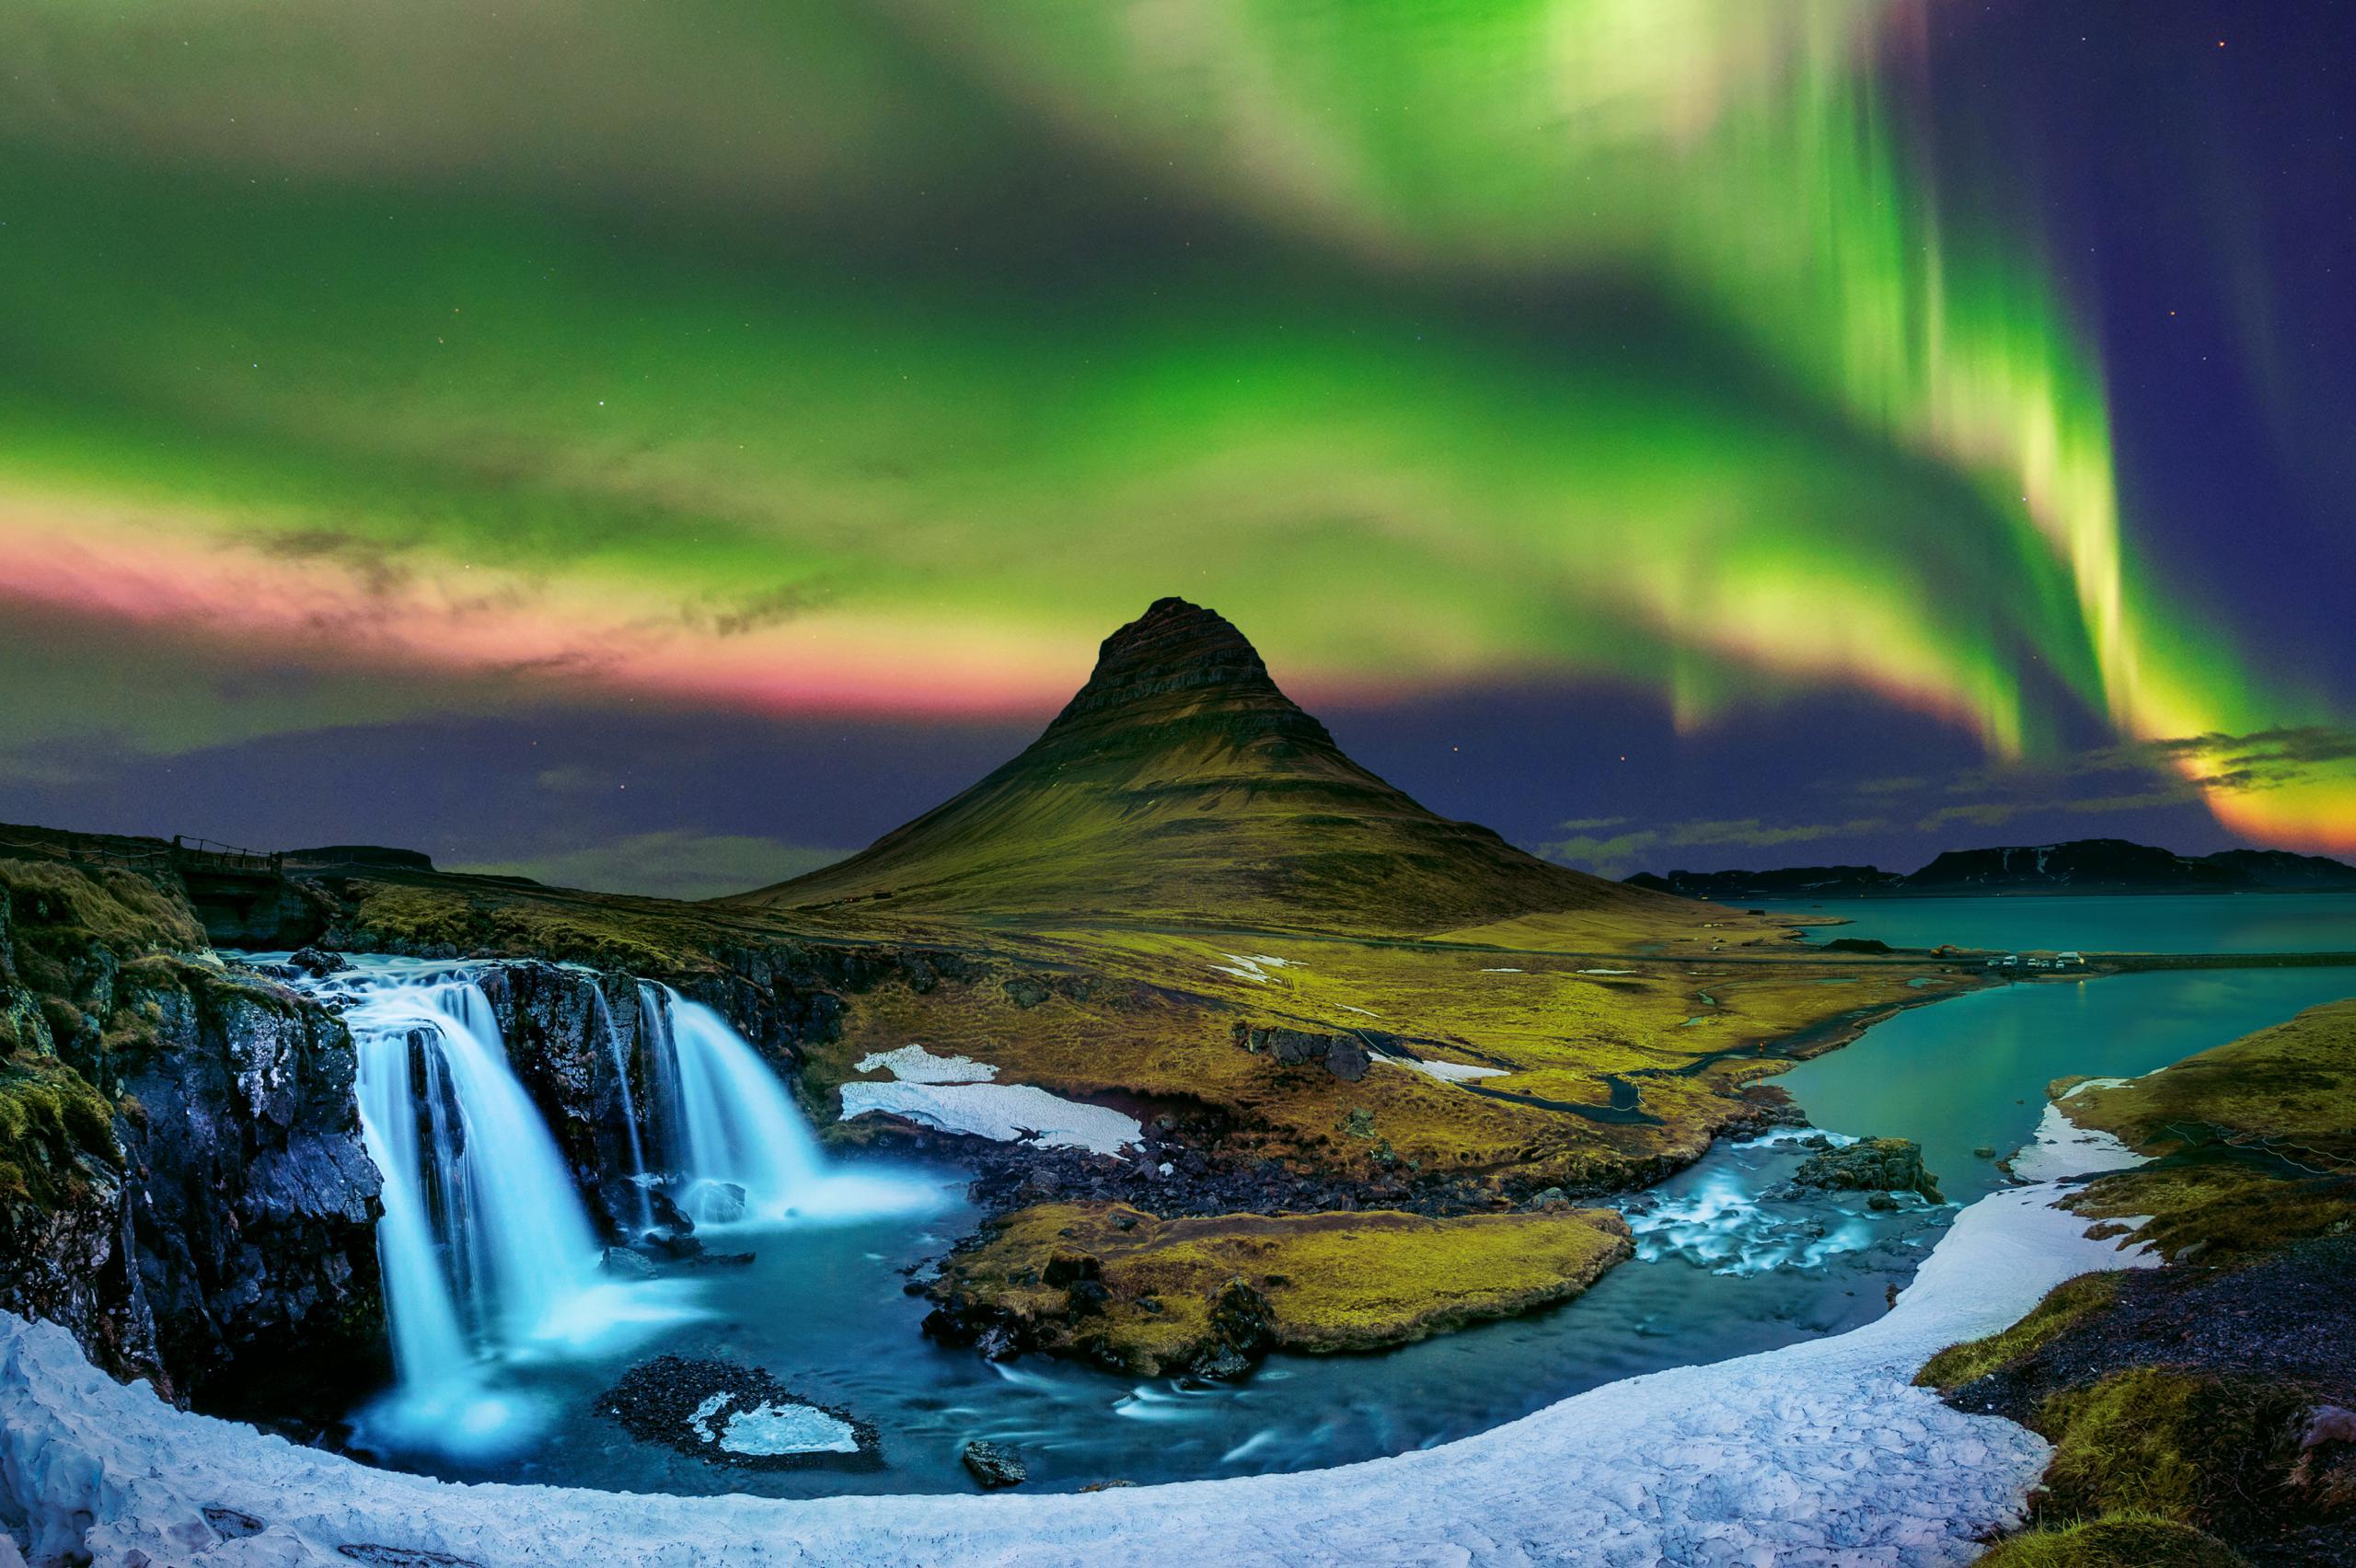 Northern-Light-Aurora-borealis-at-Kirkjufell-in-Iceland